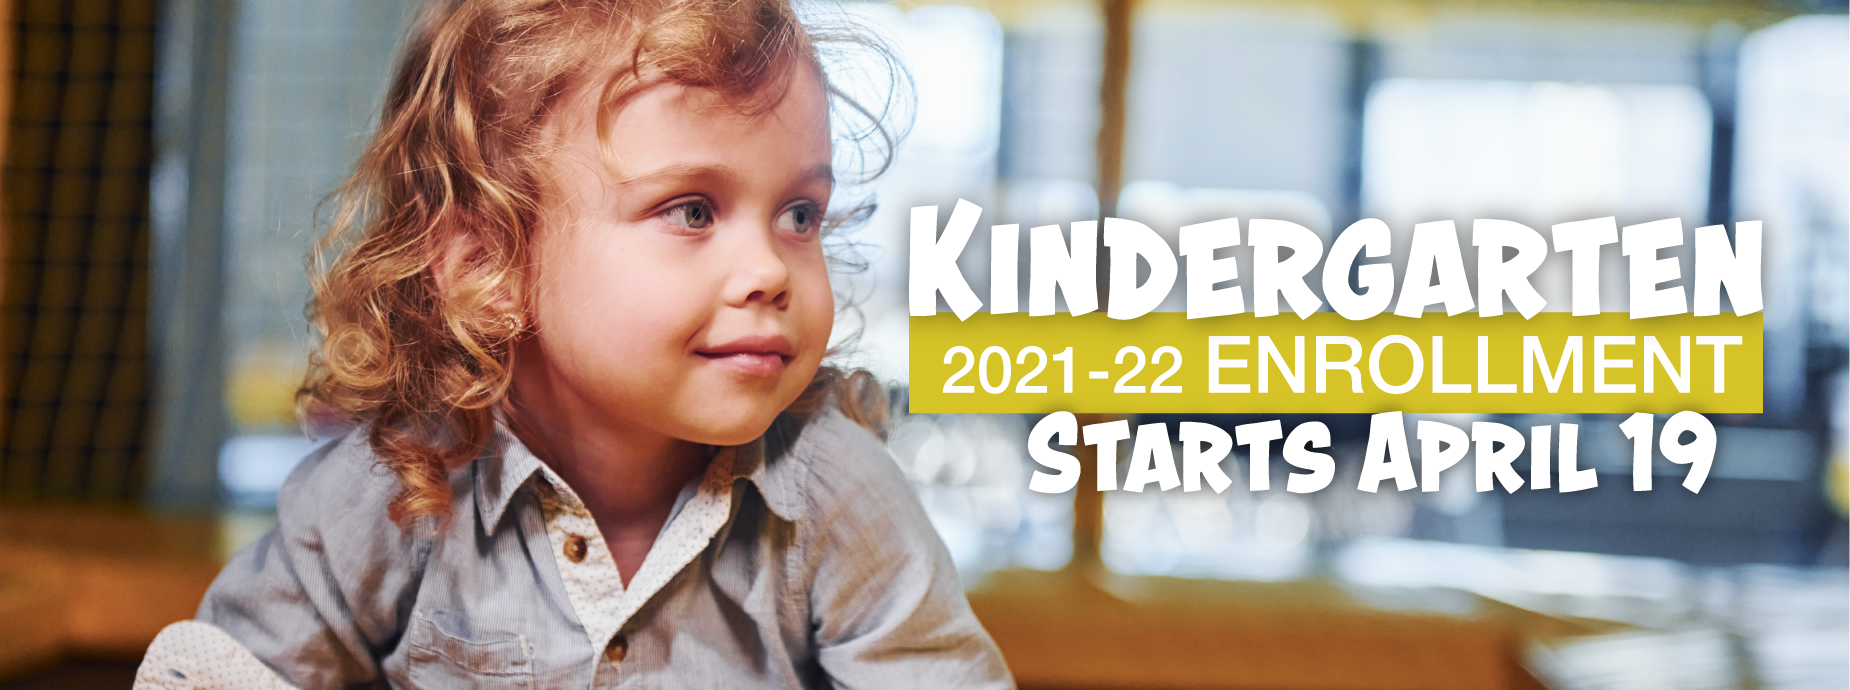 Kindergarten Enrollment 2021-22